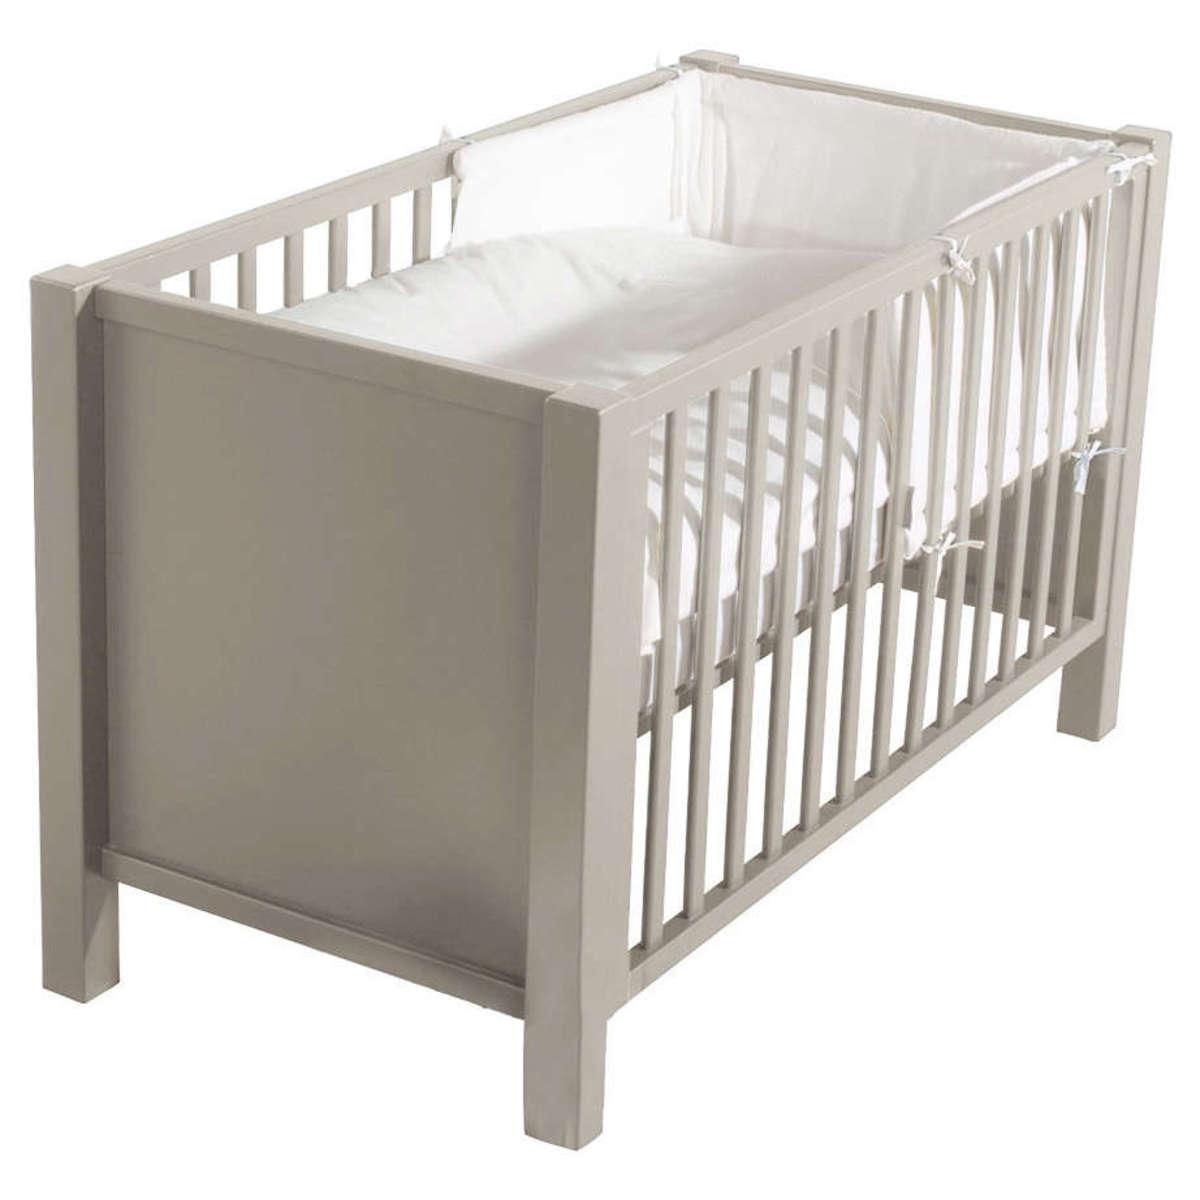 quax lit b b marie sofie grisato lit b b quax sur l. Black Bedroom Furniture Sets. Home Design Ideas